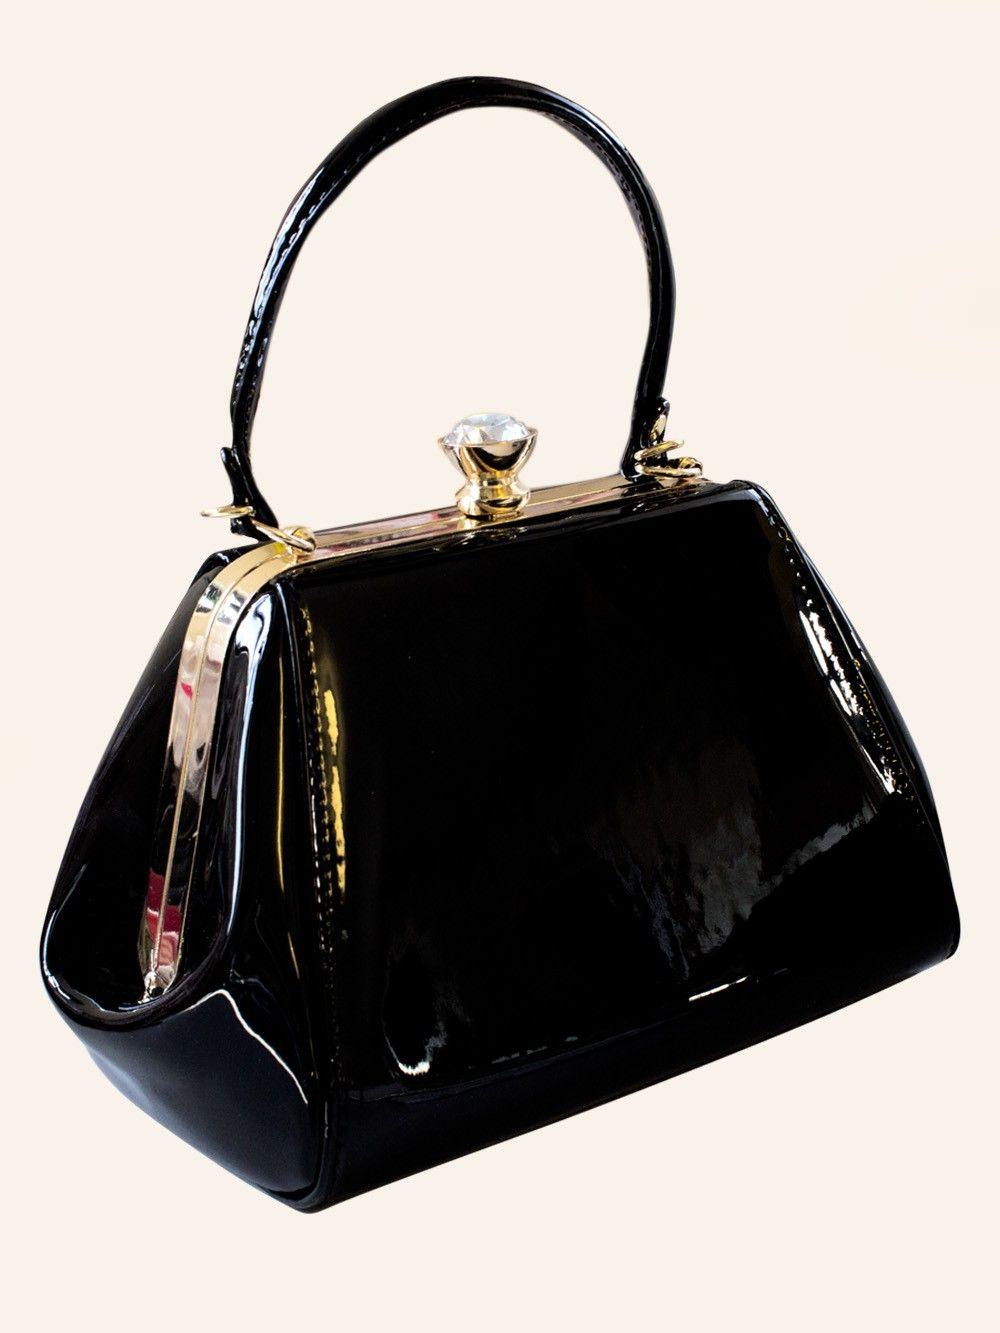 GABRIELLE'S AMAZING FANTASY CLOSET | Tiffany Patent Handbag ...